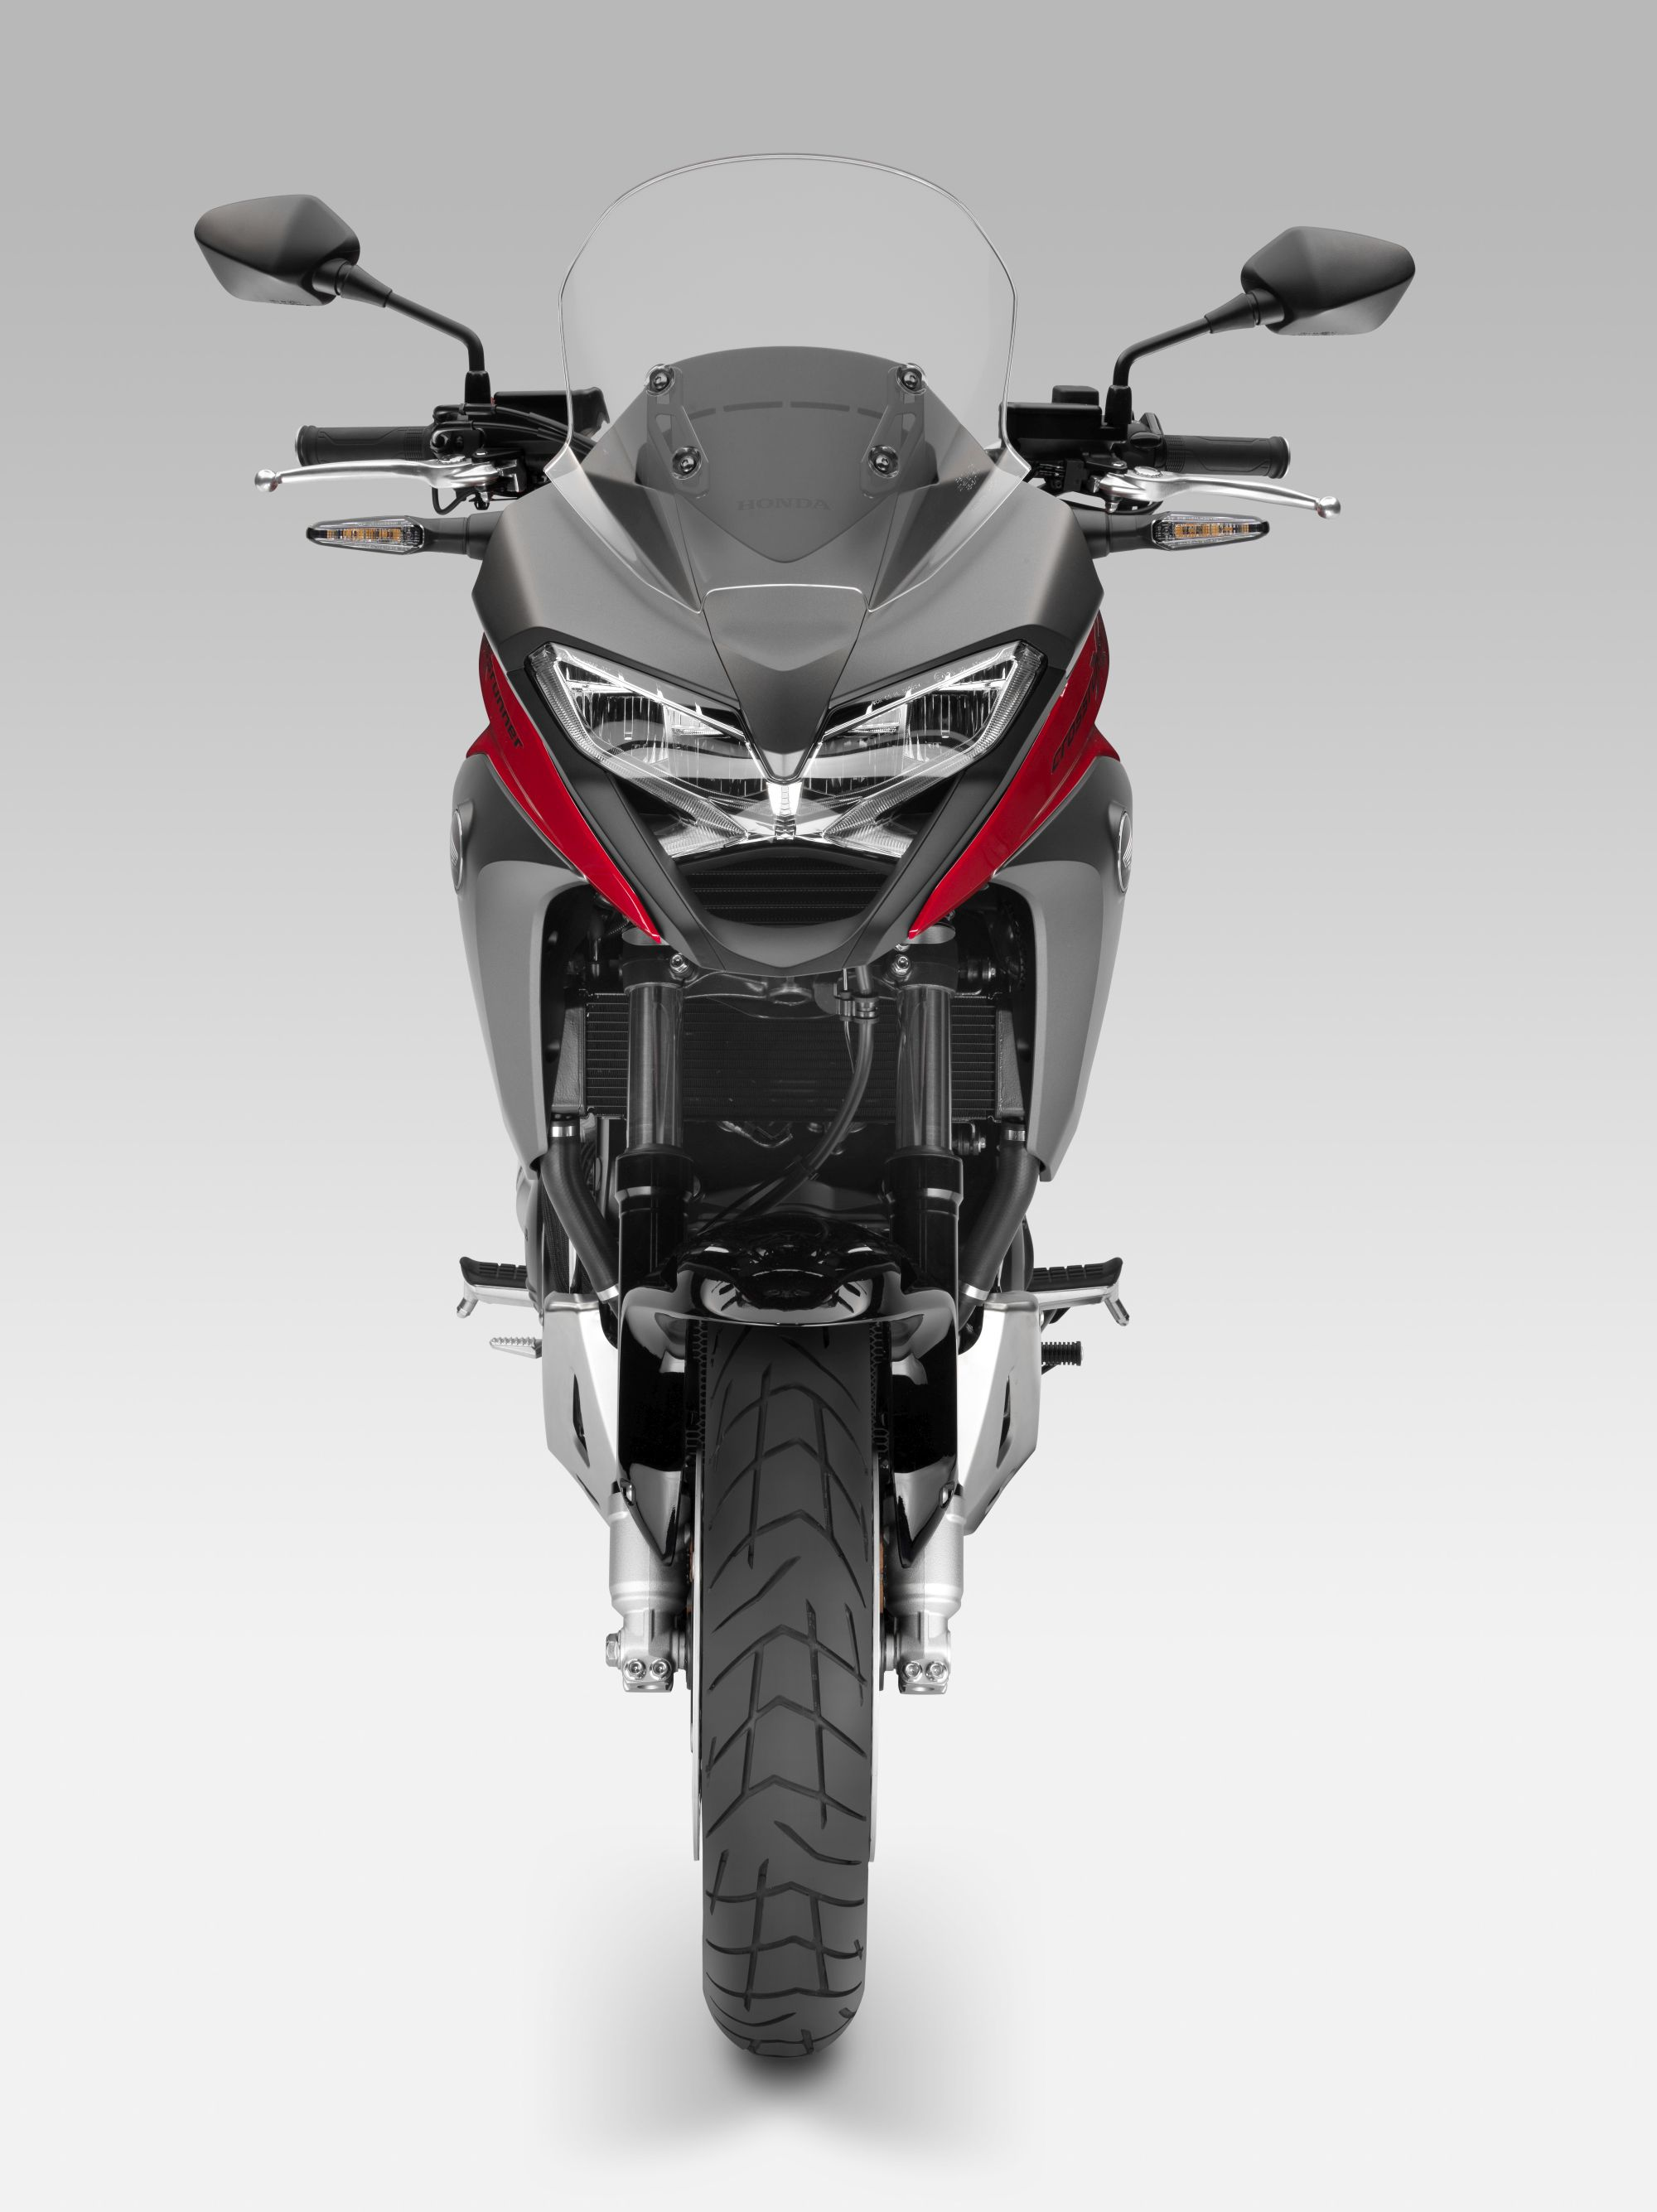 Honda Rebel 450 >> Gebrauchte und neue Honda VFR800X Crossrunner Motorräder ...